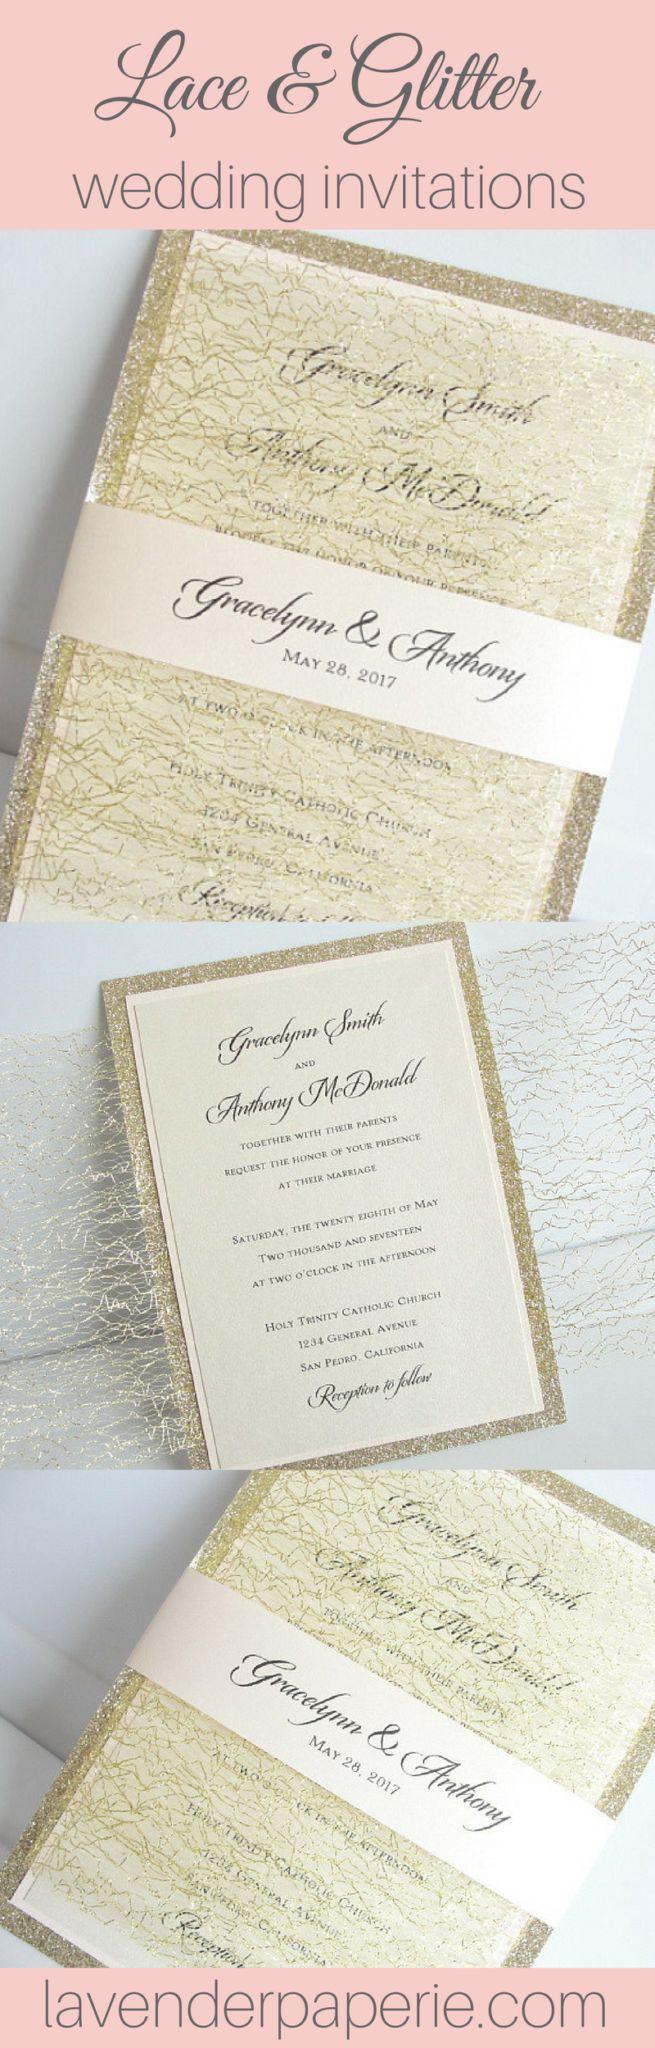 730 Best Luxury Wedding Ideas Images On Pinterest Luxury Wedding